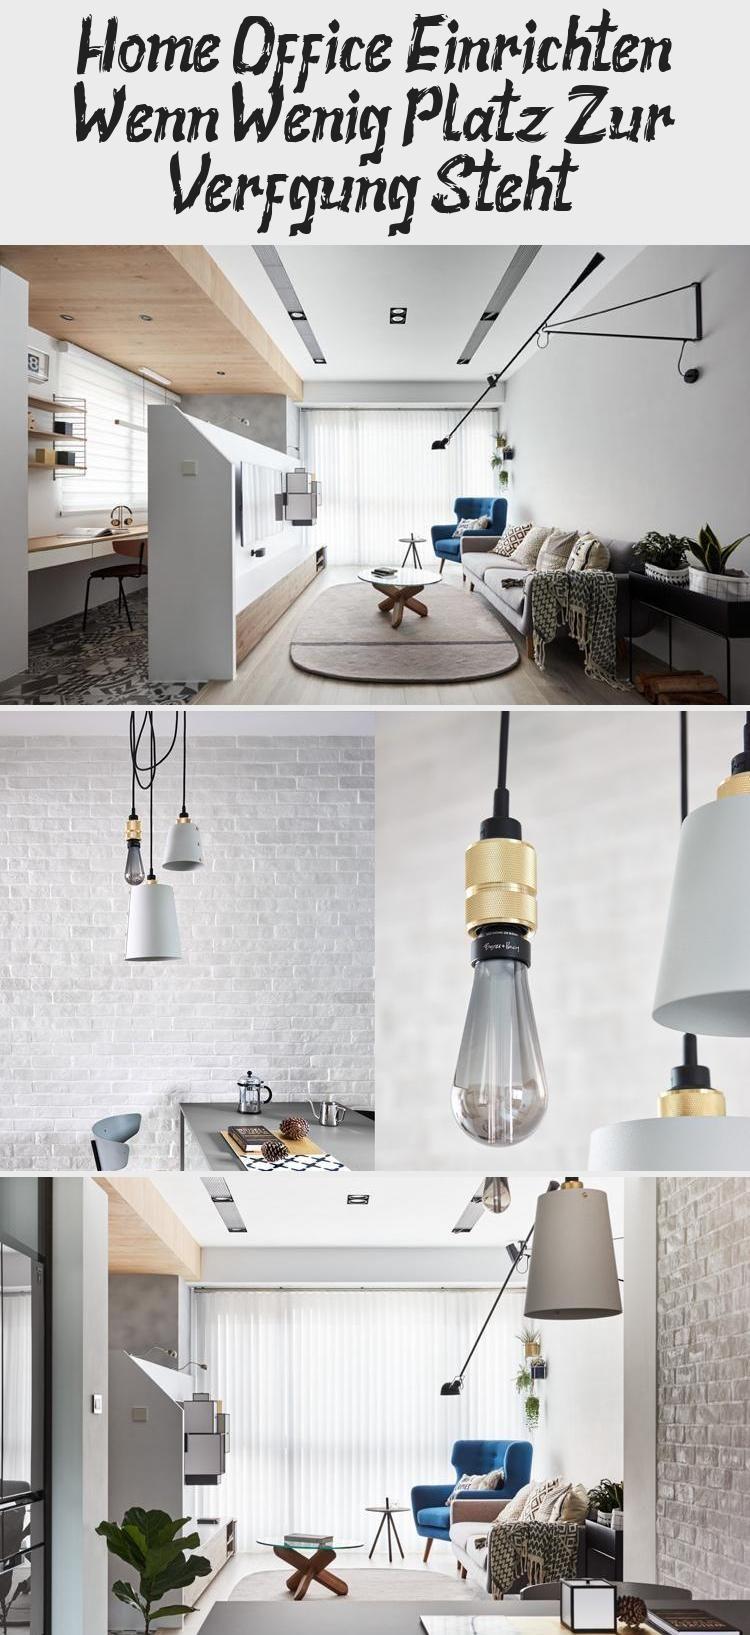 De Blogen – De Blogen in 9  Home decor, House, Home office